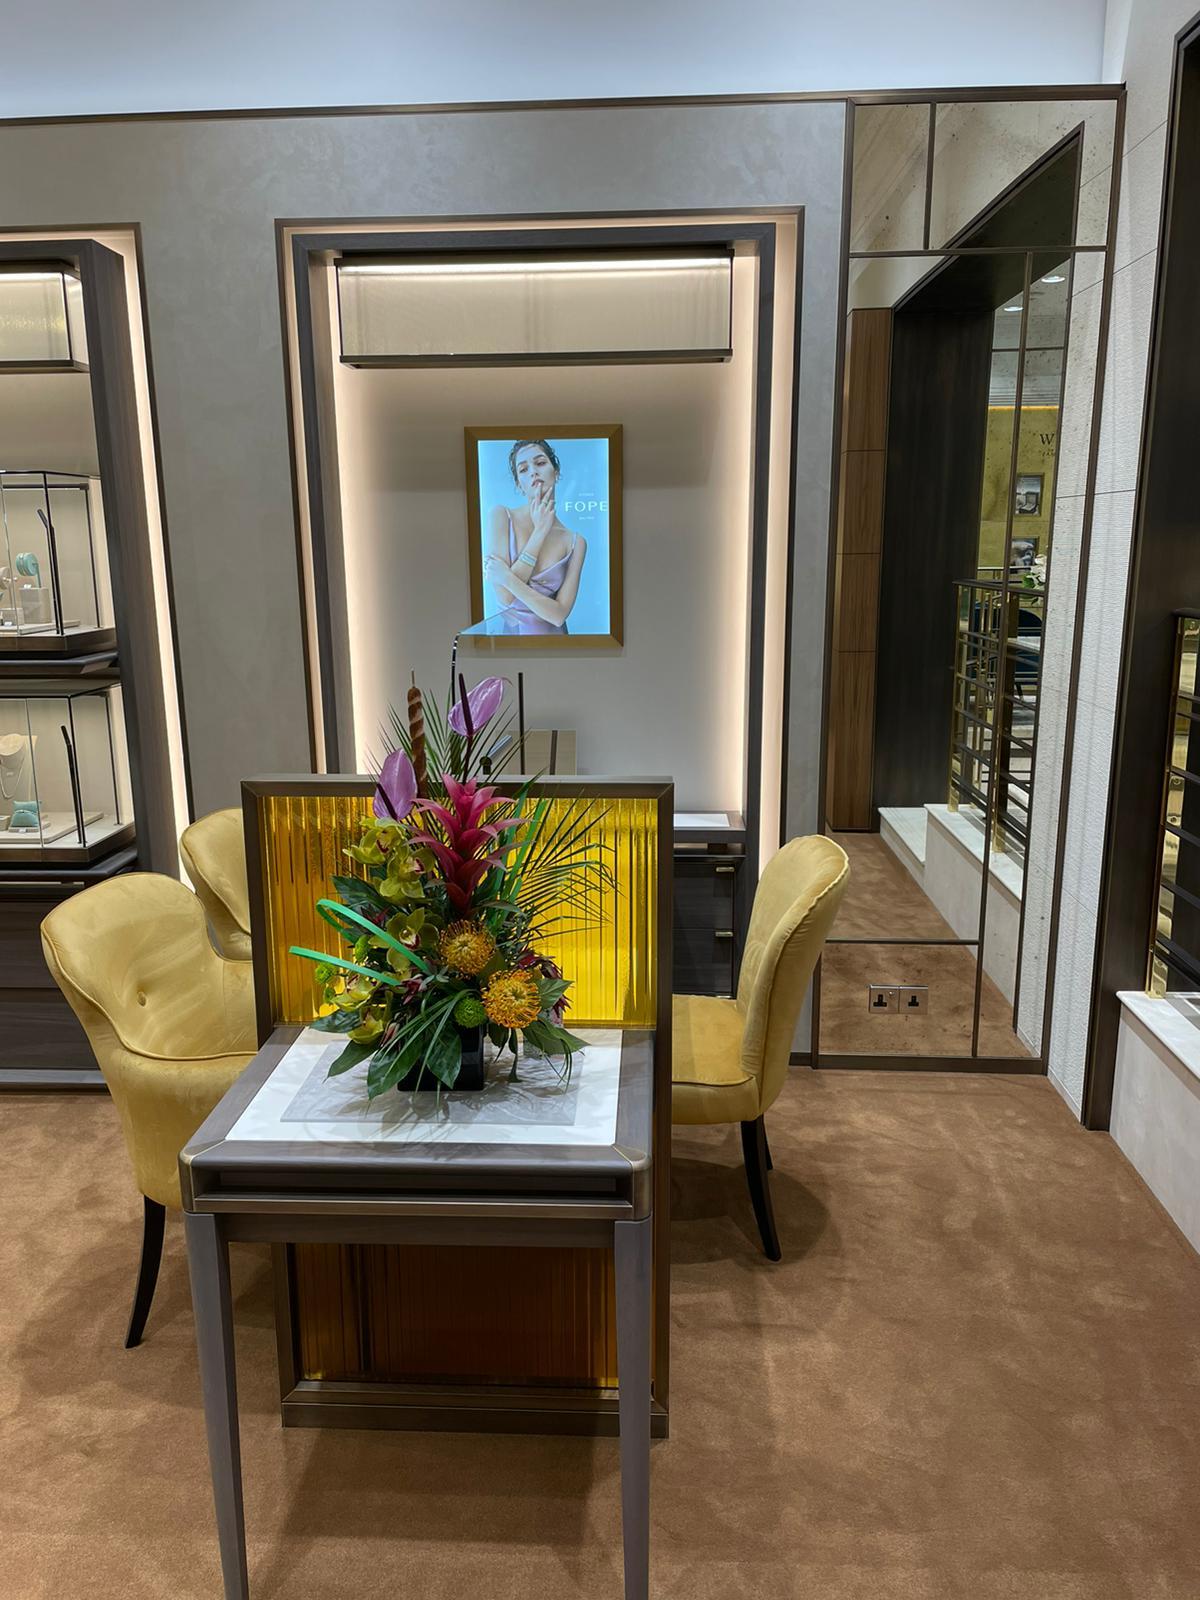 Wakefields Jewellers Refurbishment Reopening - Inside Store - FOPE Jewellery Display